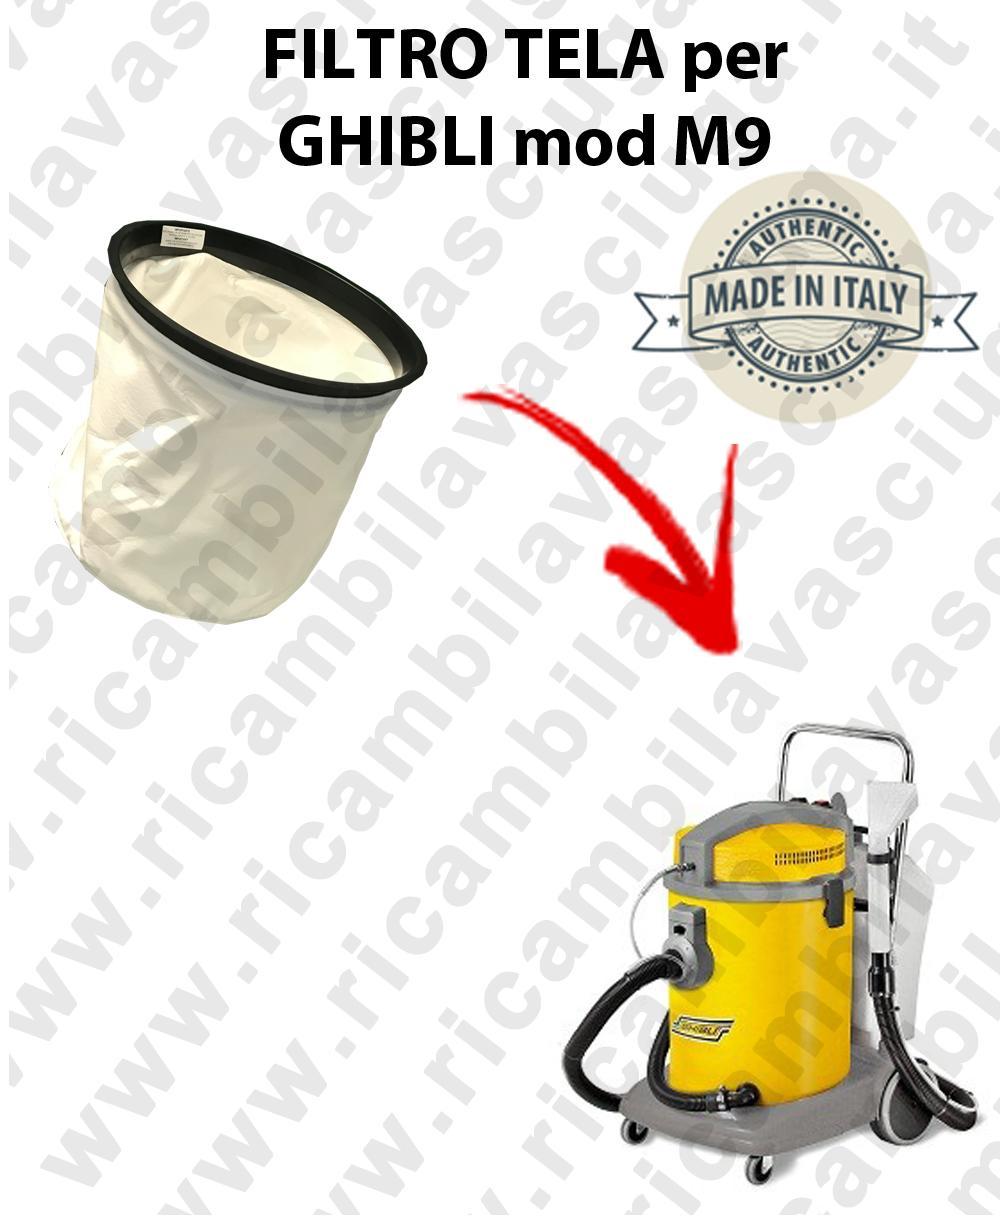 Filtro de tela para aspiradora GHIBLI Model M9